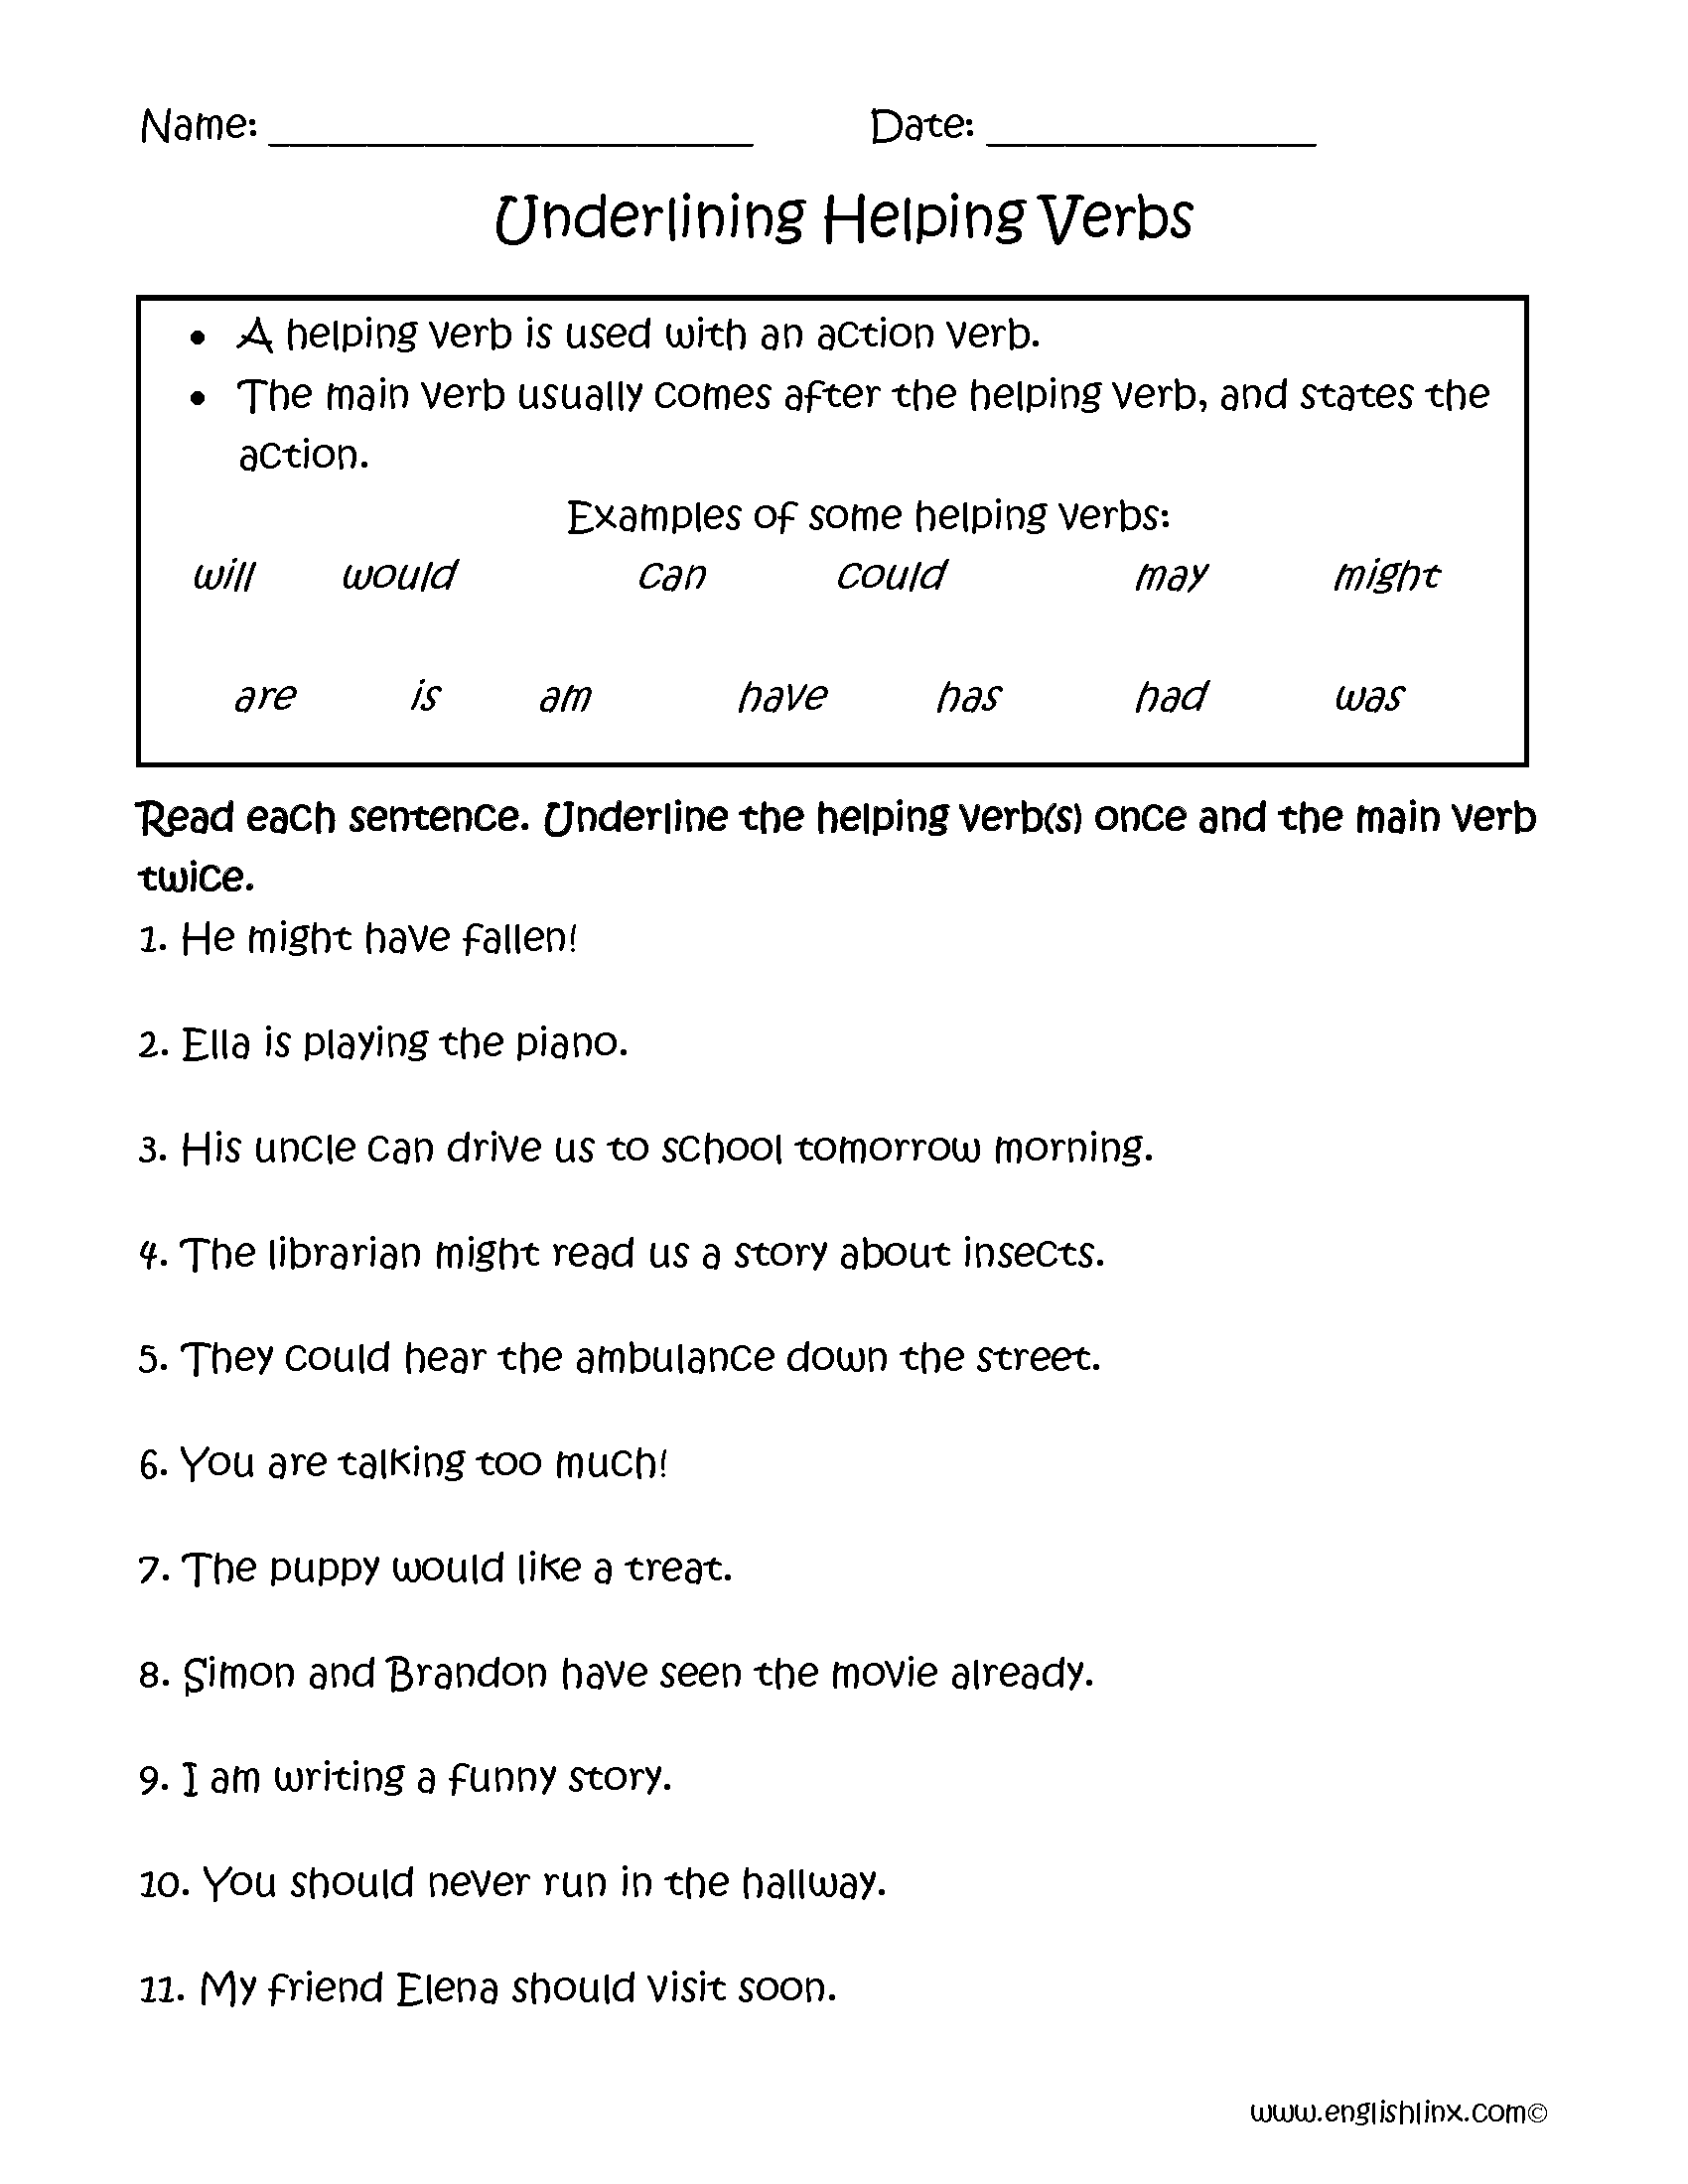 Verbs Worksheets Helping Kindergarten Noun And Verb Underlining